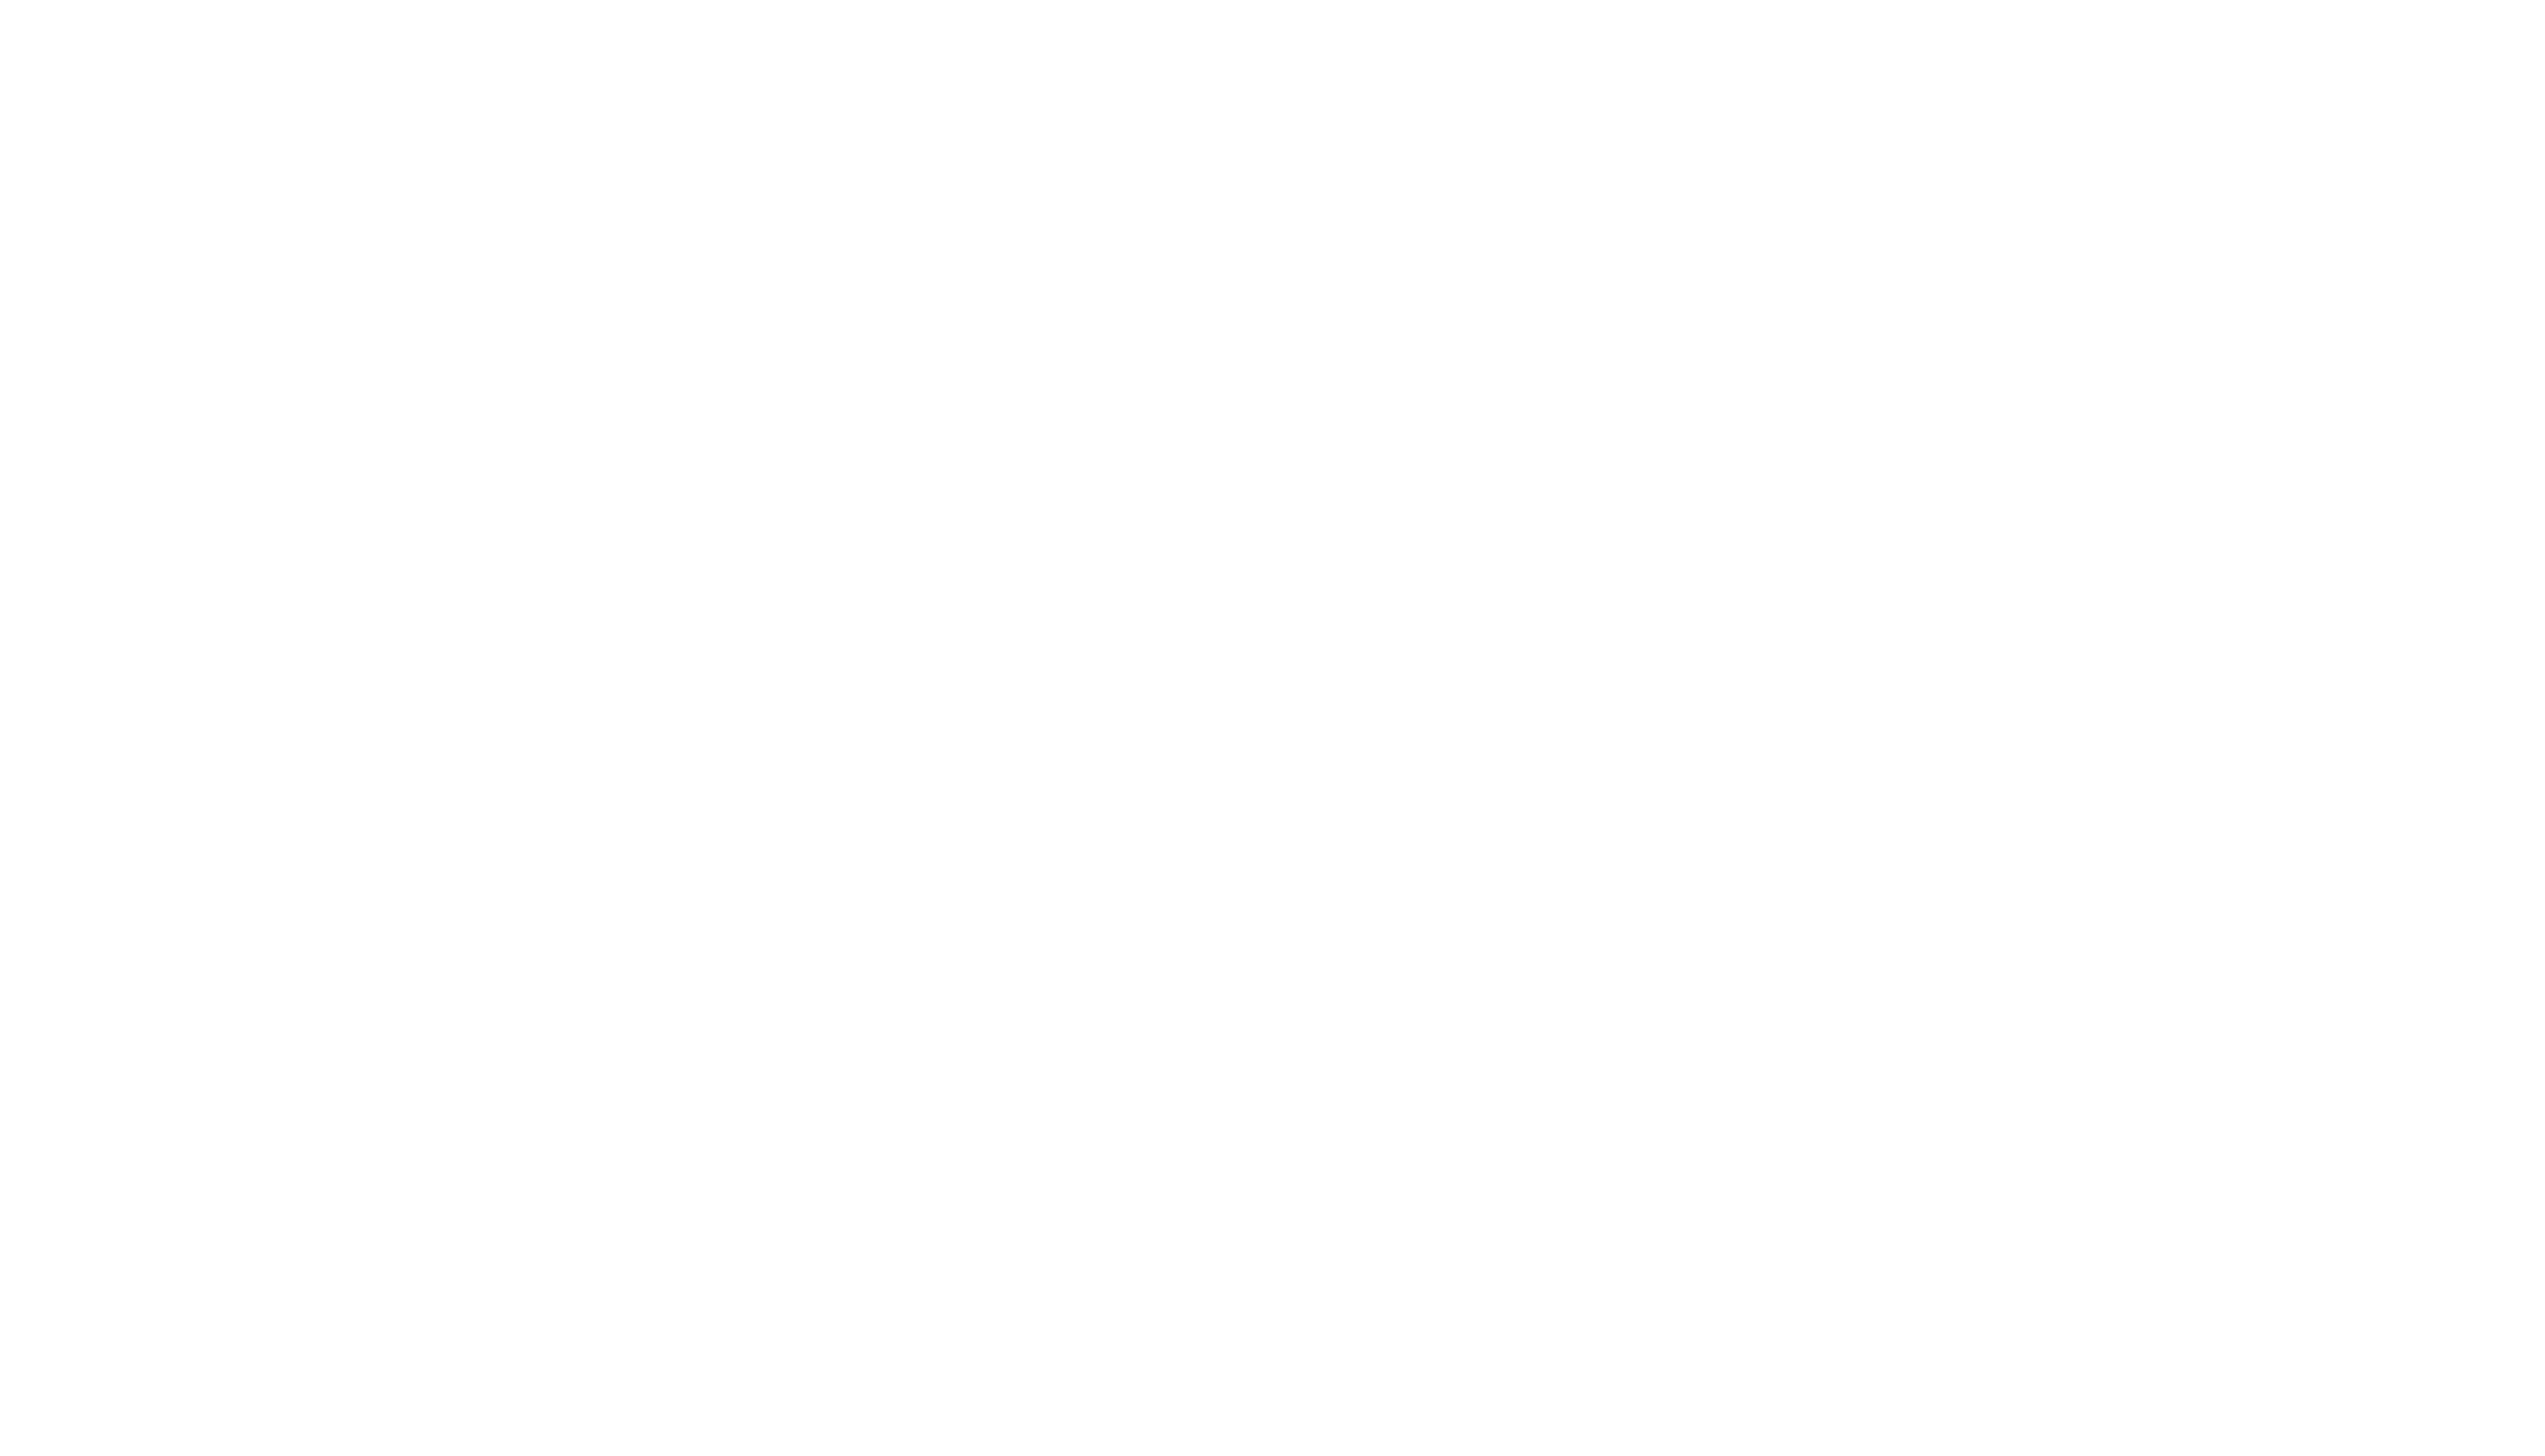 mindparachutes_whiteStrokeLogo